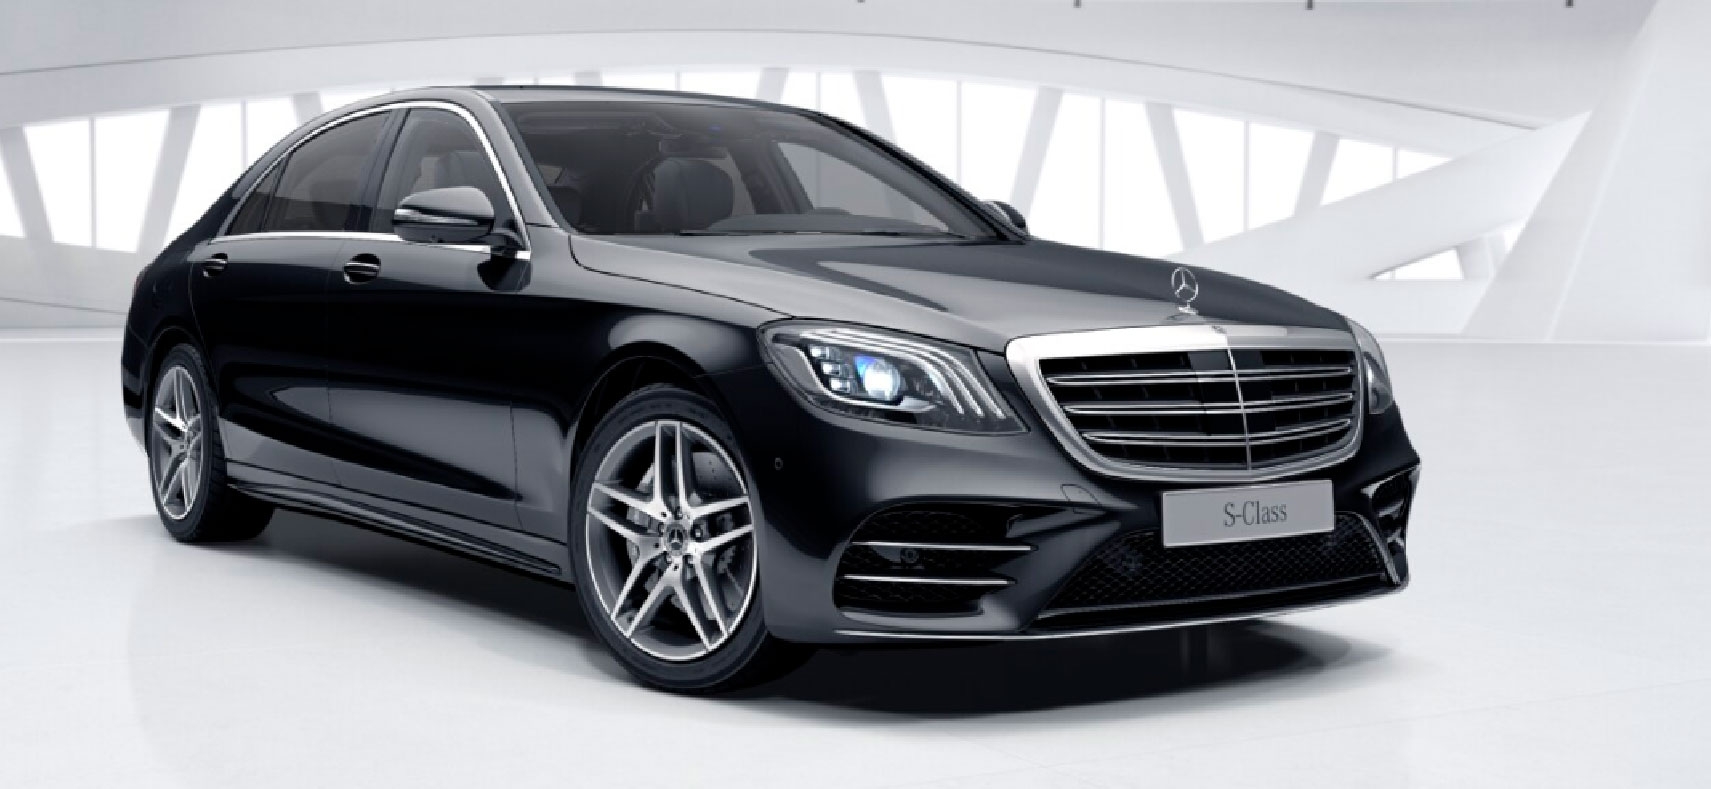 Mercedes-Benz S-Class Limousine 0052600188